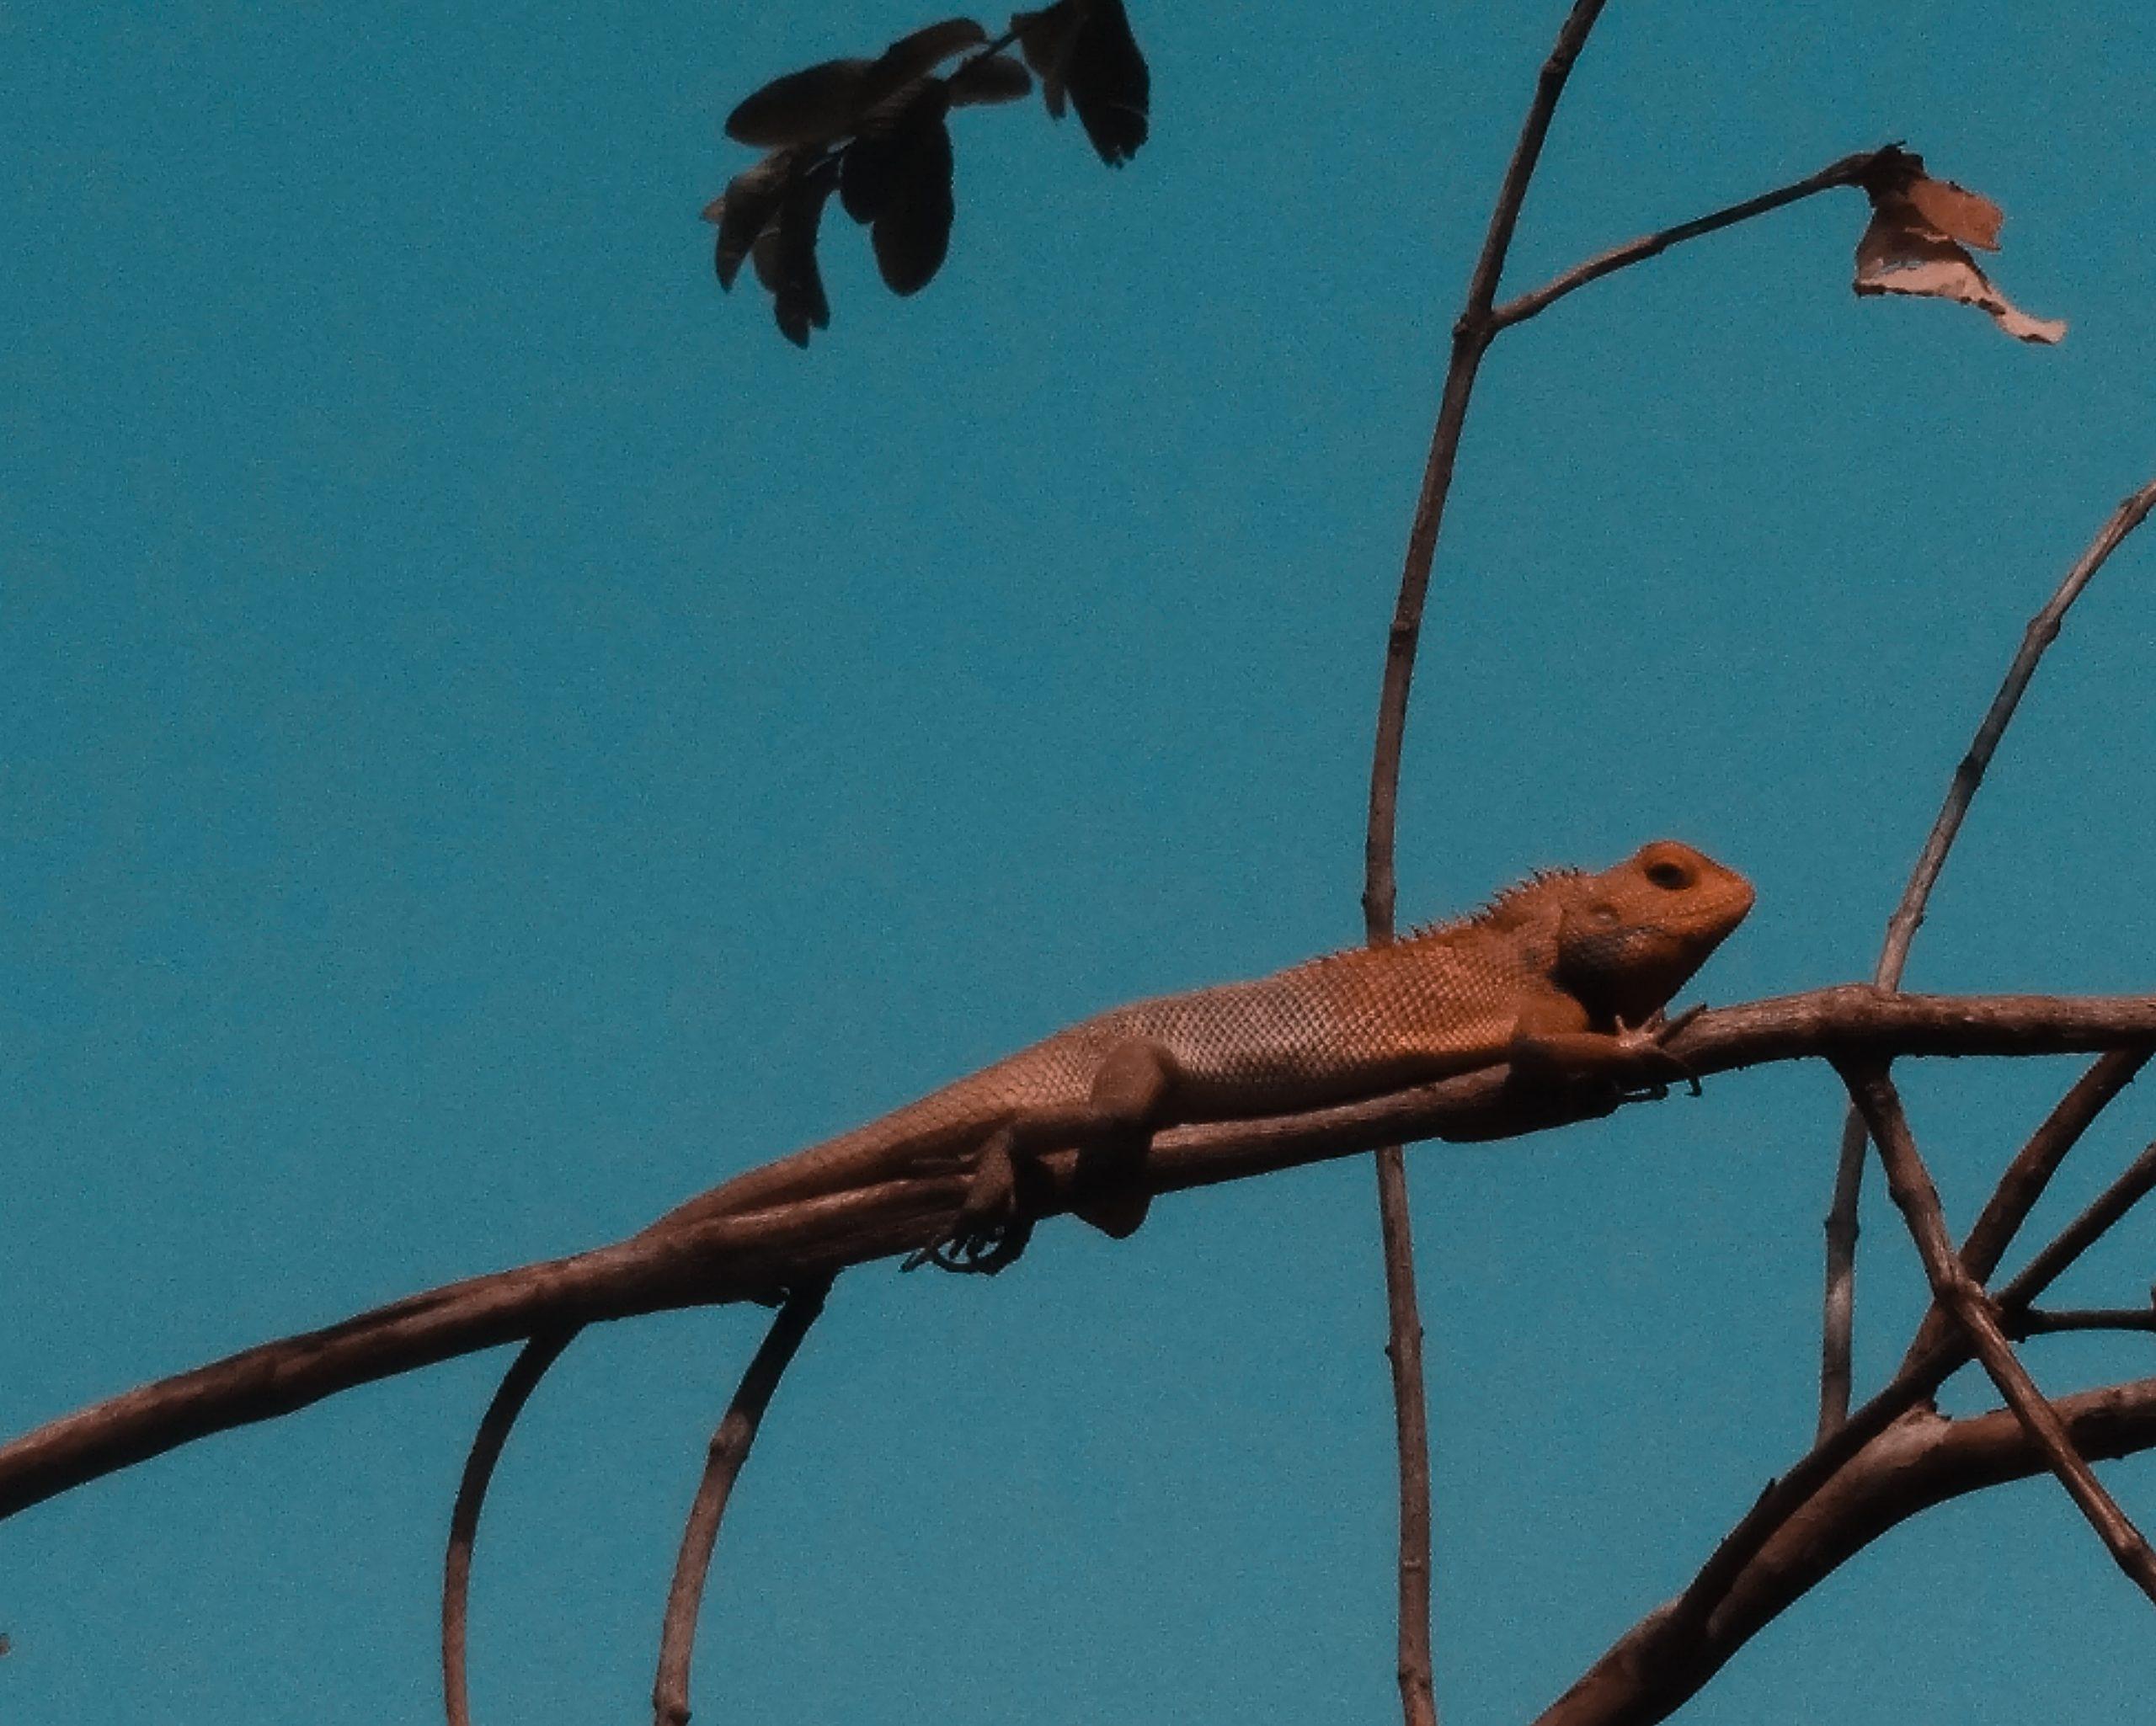 Lizard on the plant stem